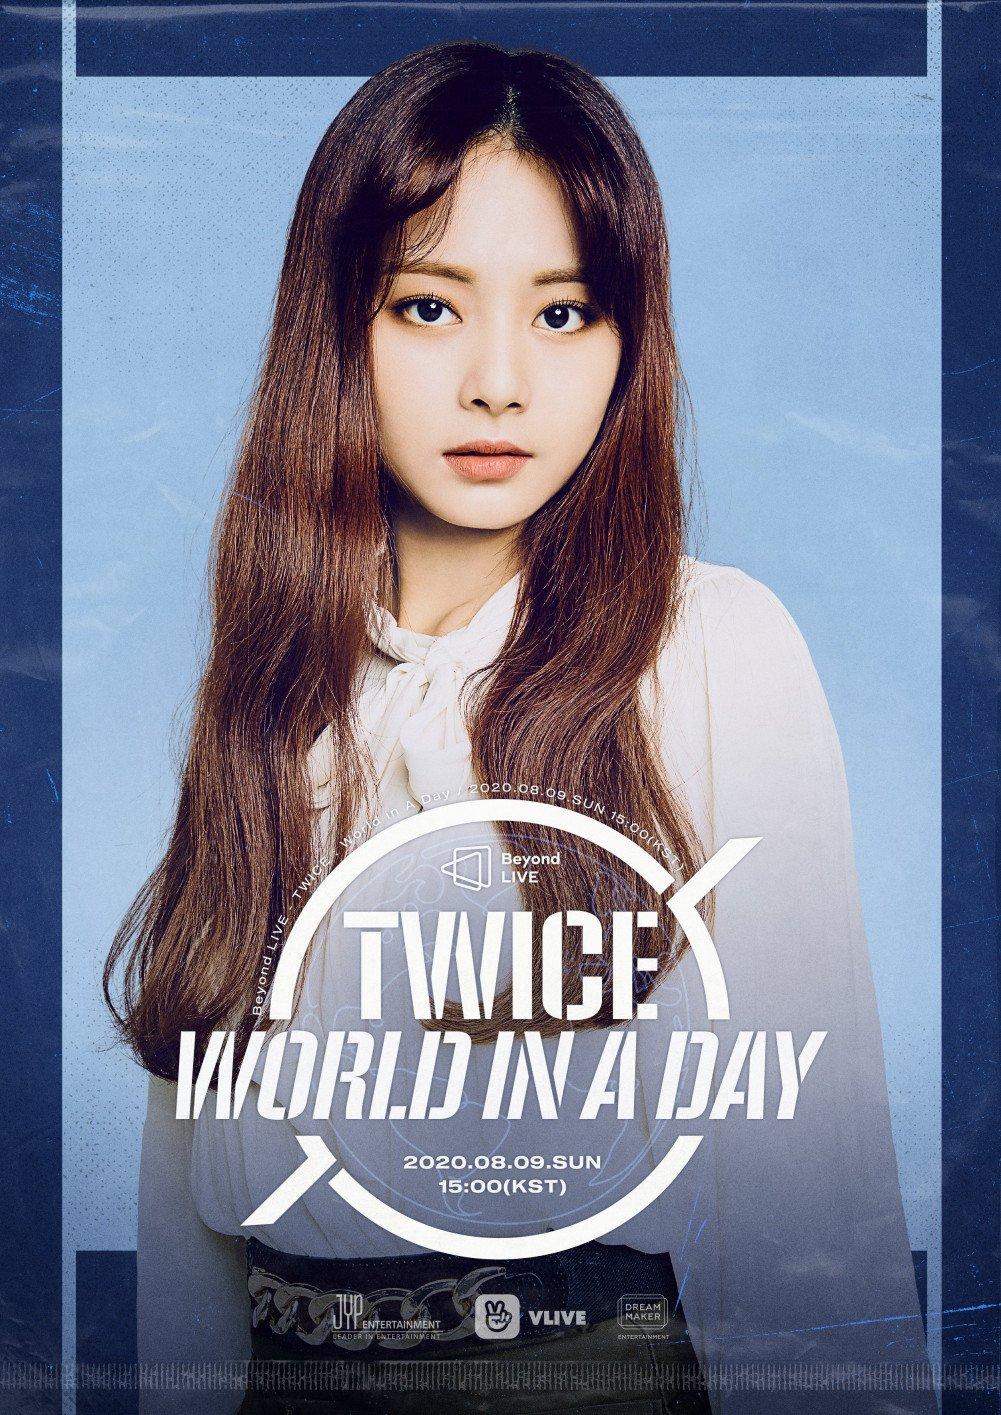 twice-members-teaser-posters-online-concert-3